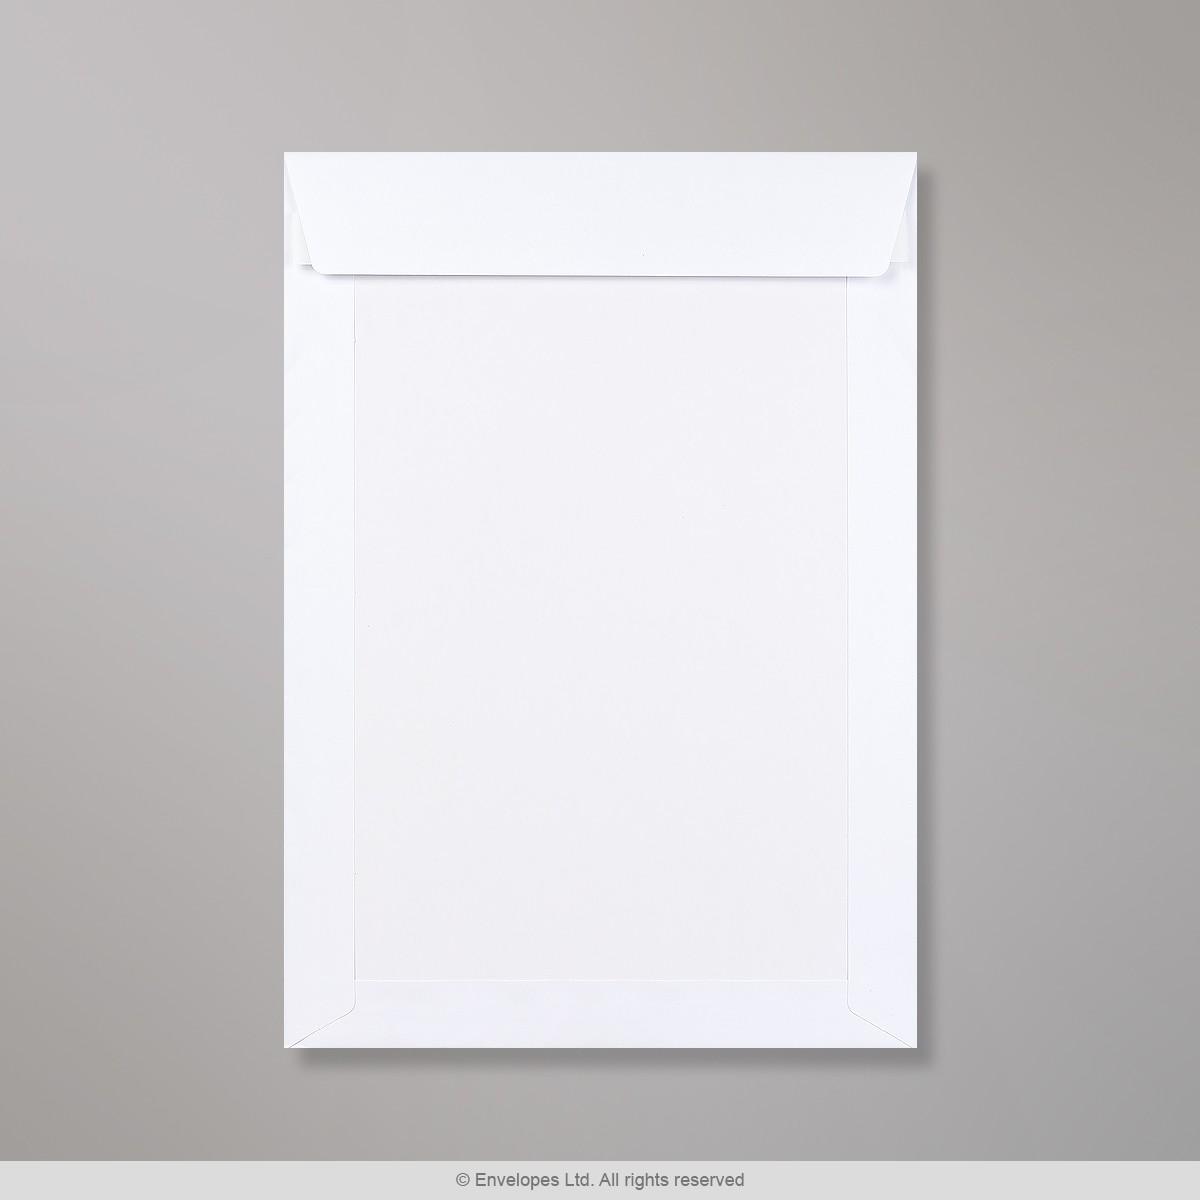 312x220 mm Busta con dorso rigido bianca